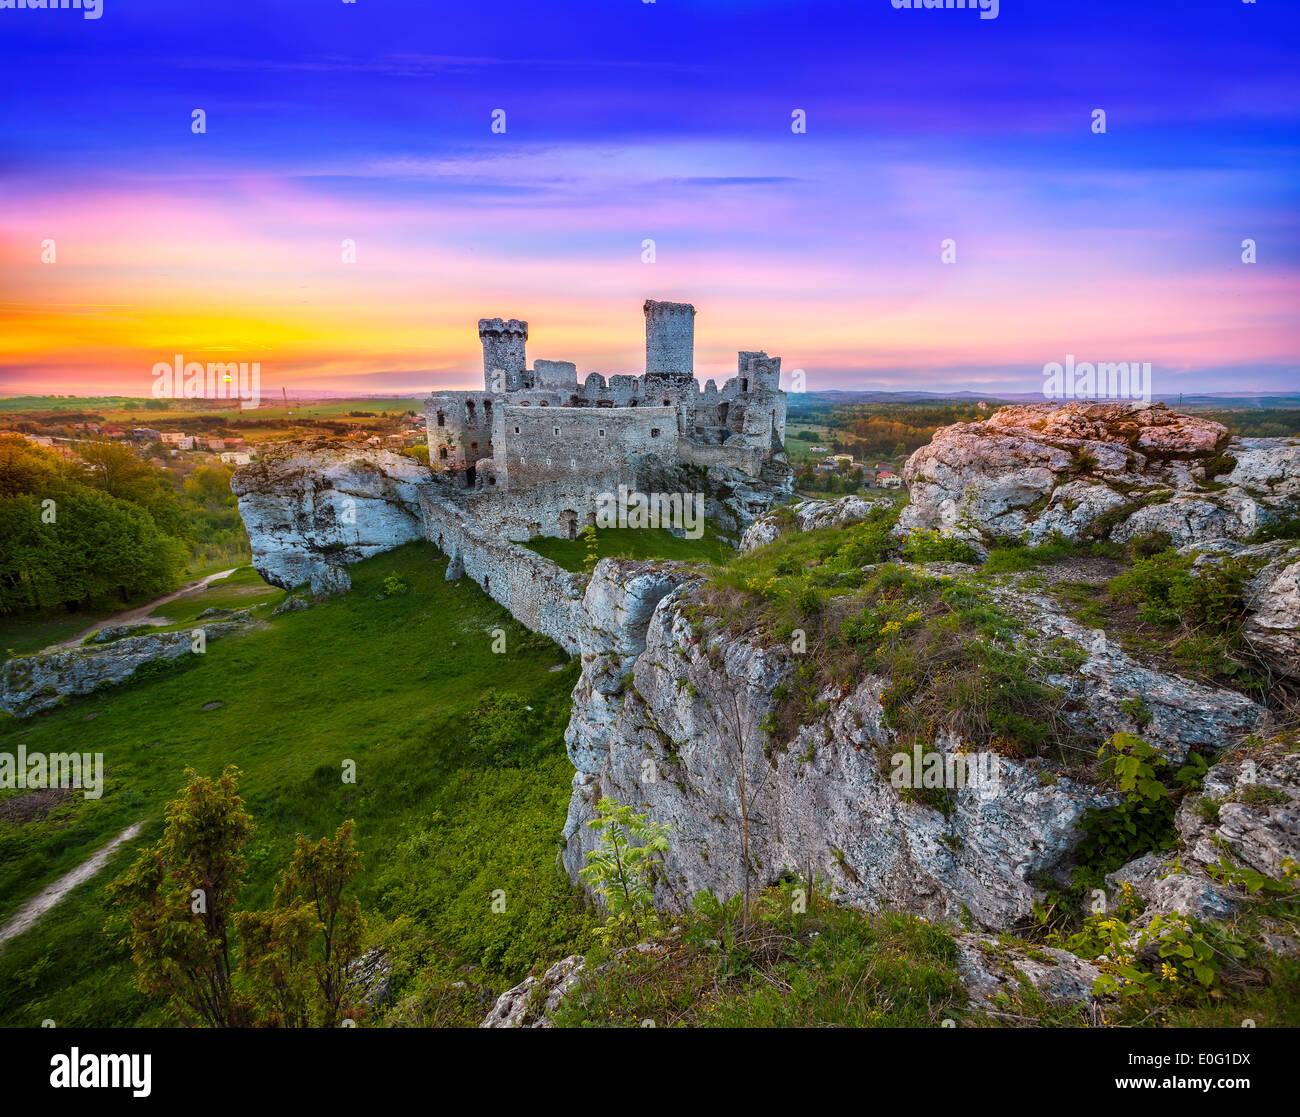 Beautiful sunset over Ogrodzieniec castle, Poland. - Stock Image